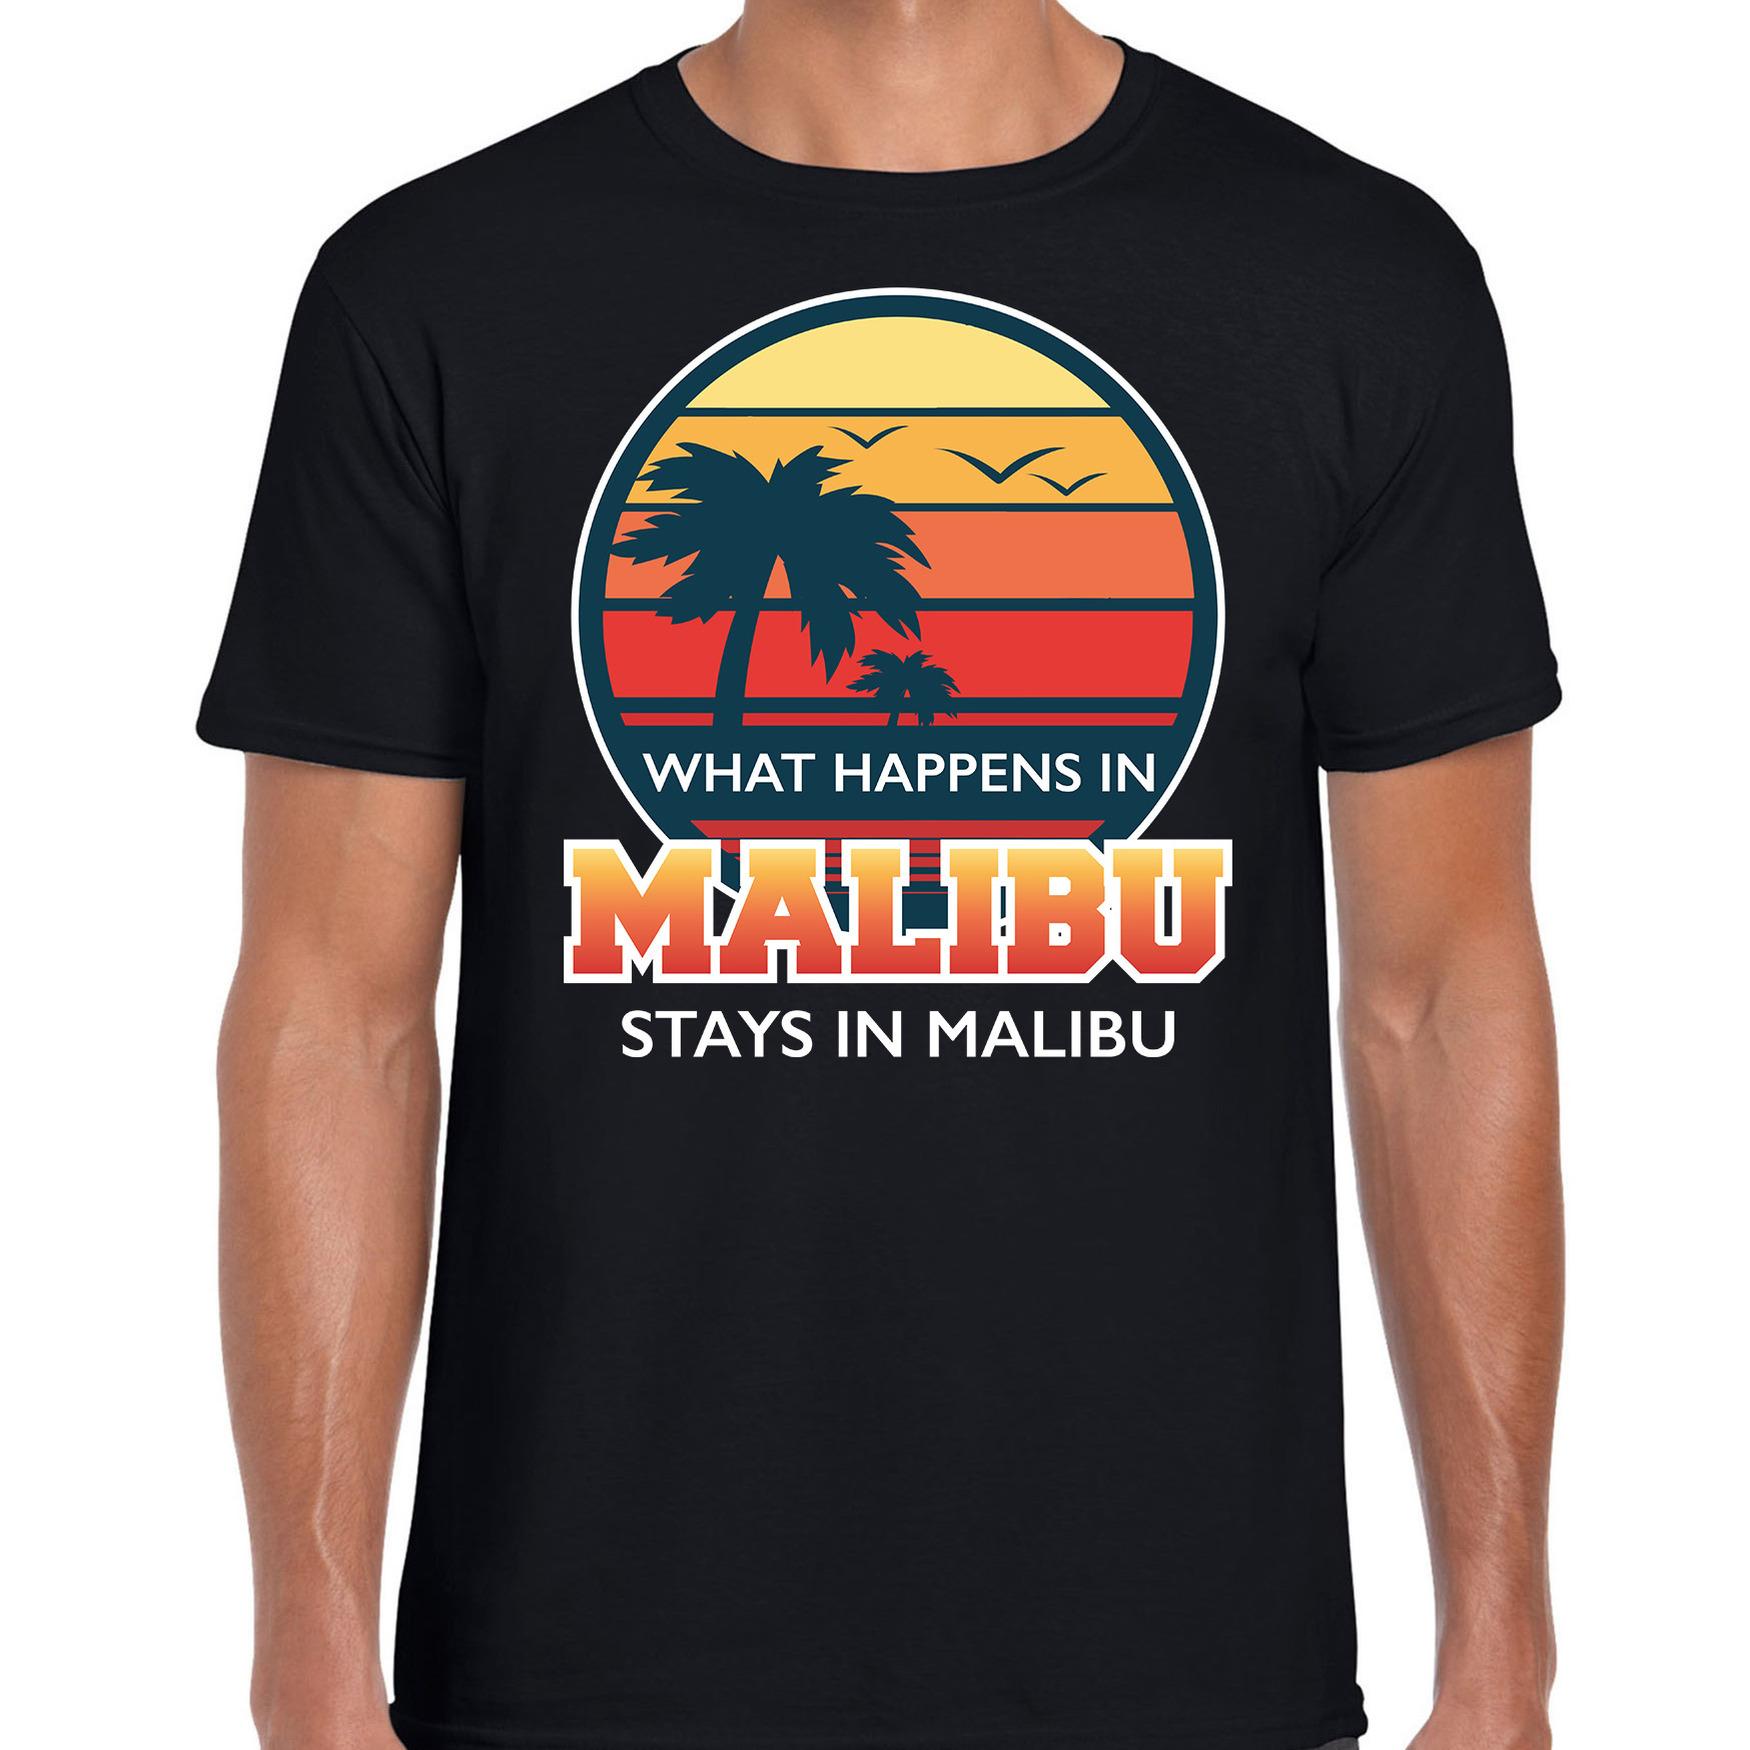 What happens in Malibu stays in Malibu shirt beach party - vakantie outfit - kleding zwart voor here